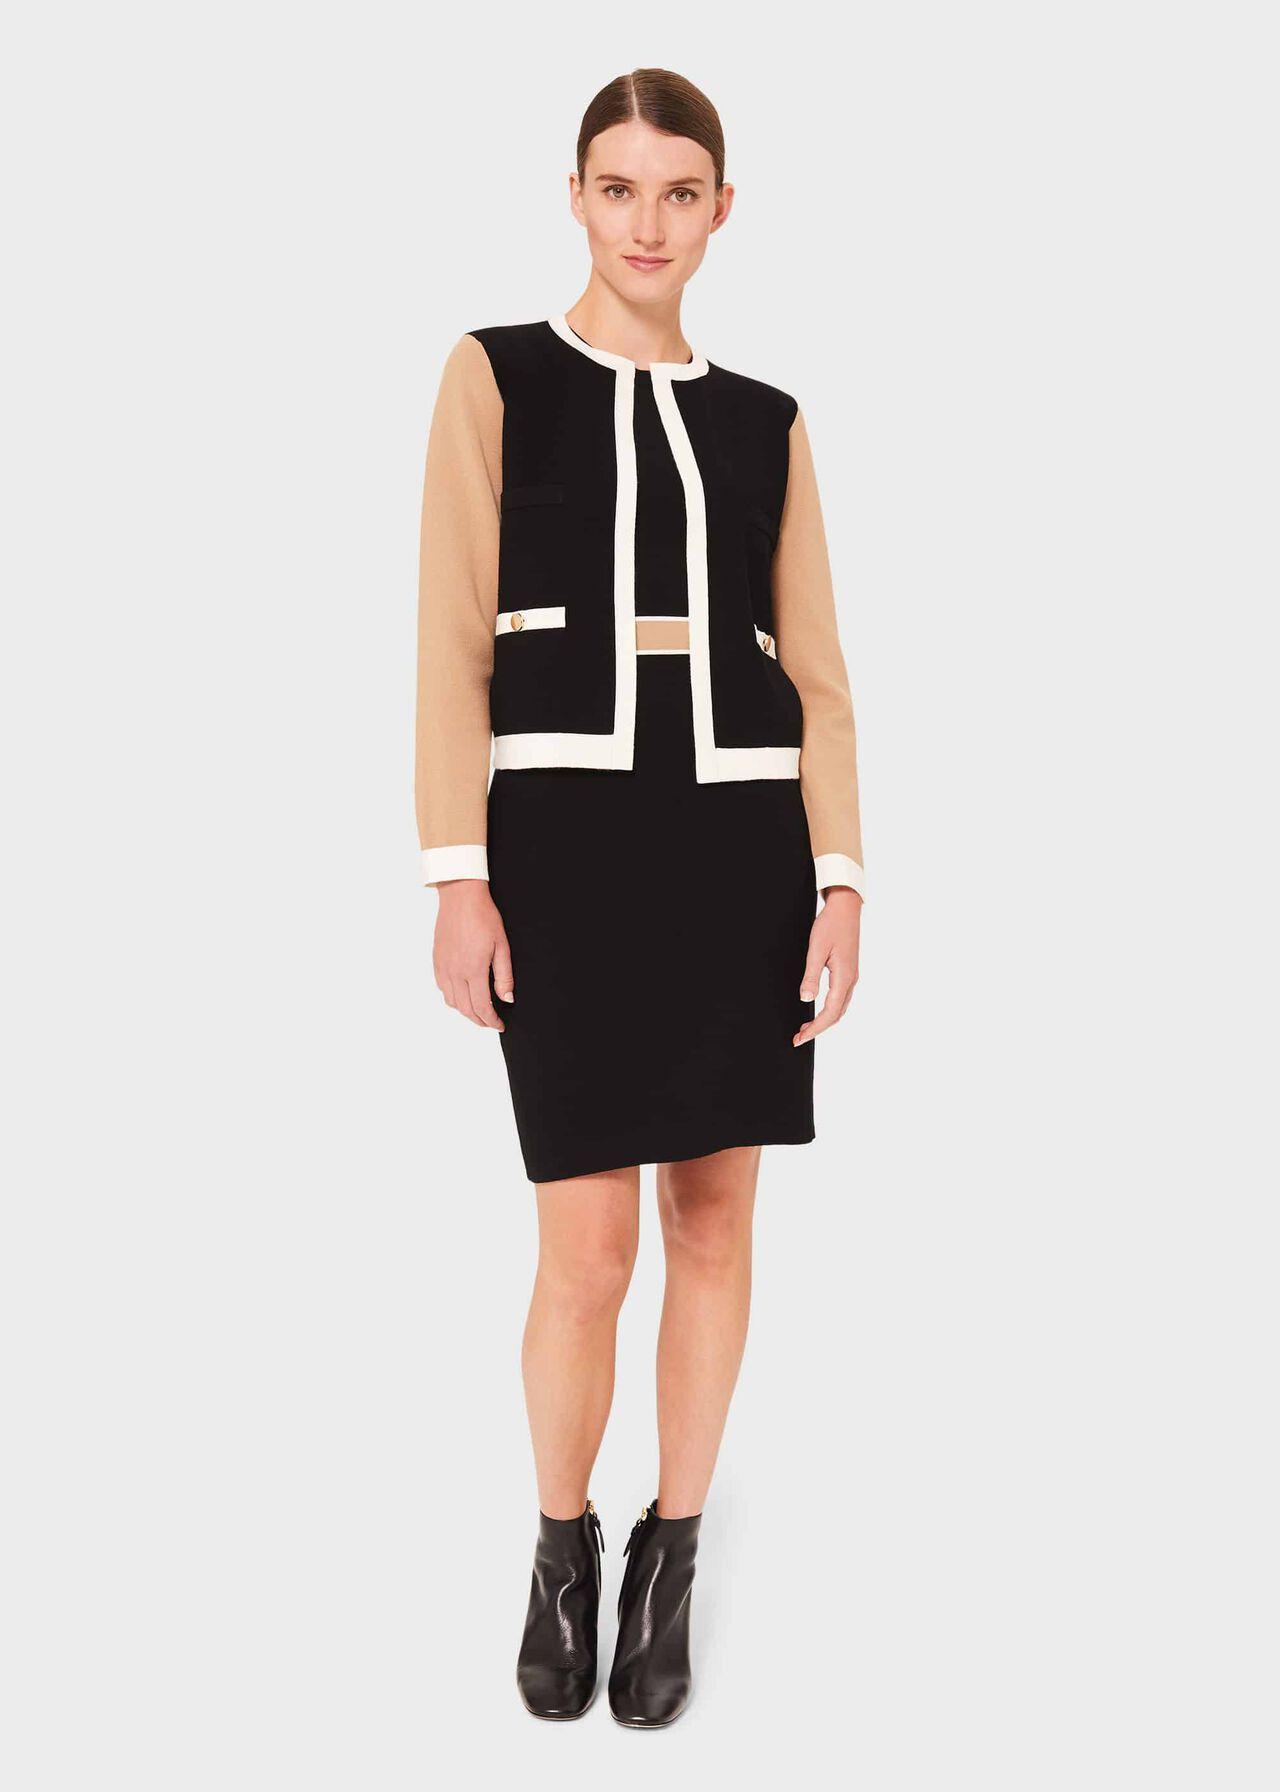 Aria Milano Jacket, Black Multi, hi-res